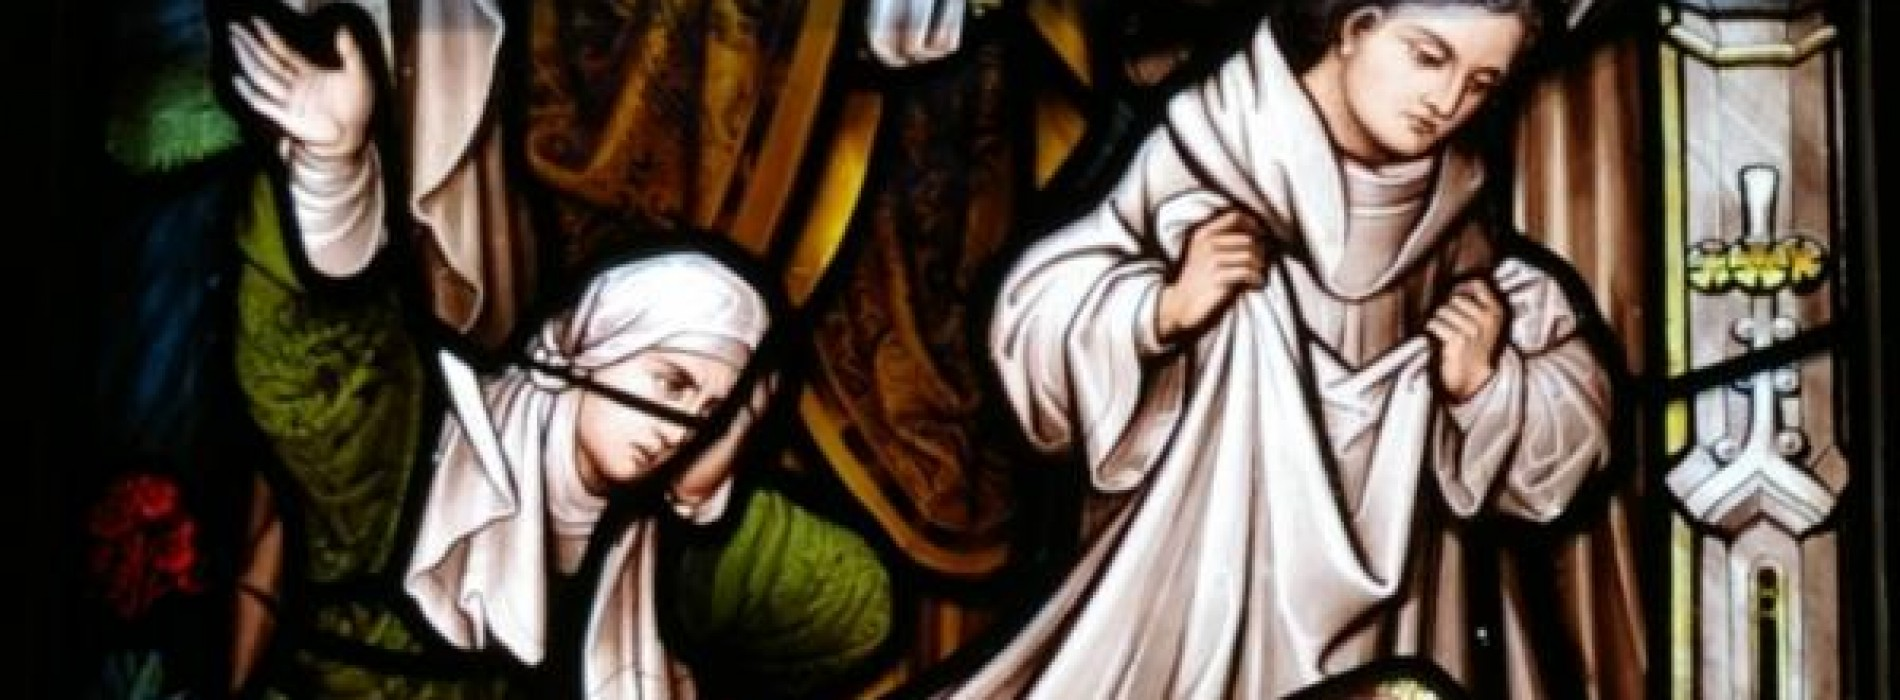 ST PATRICK…THE SLAVE TRADER?